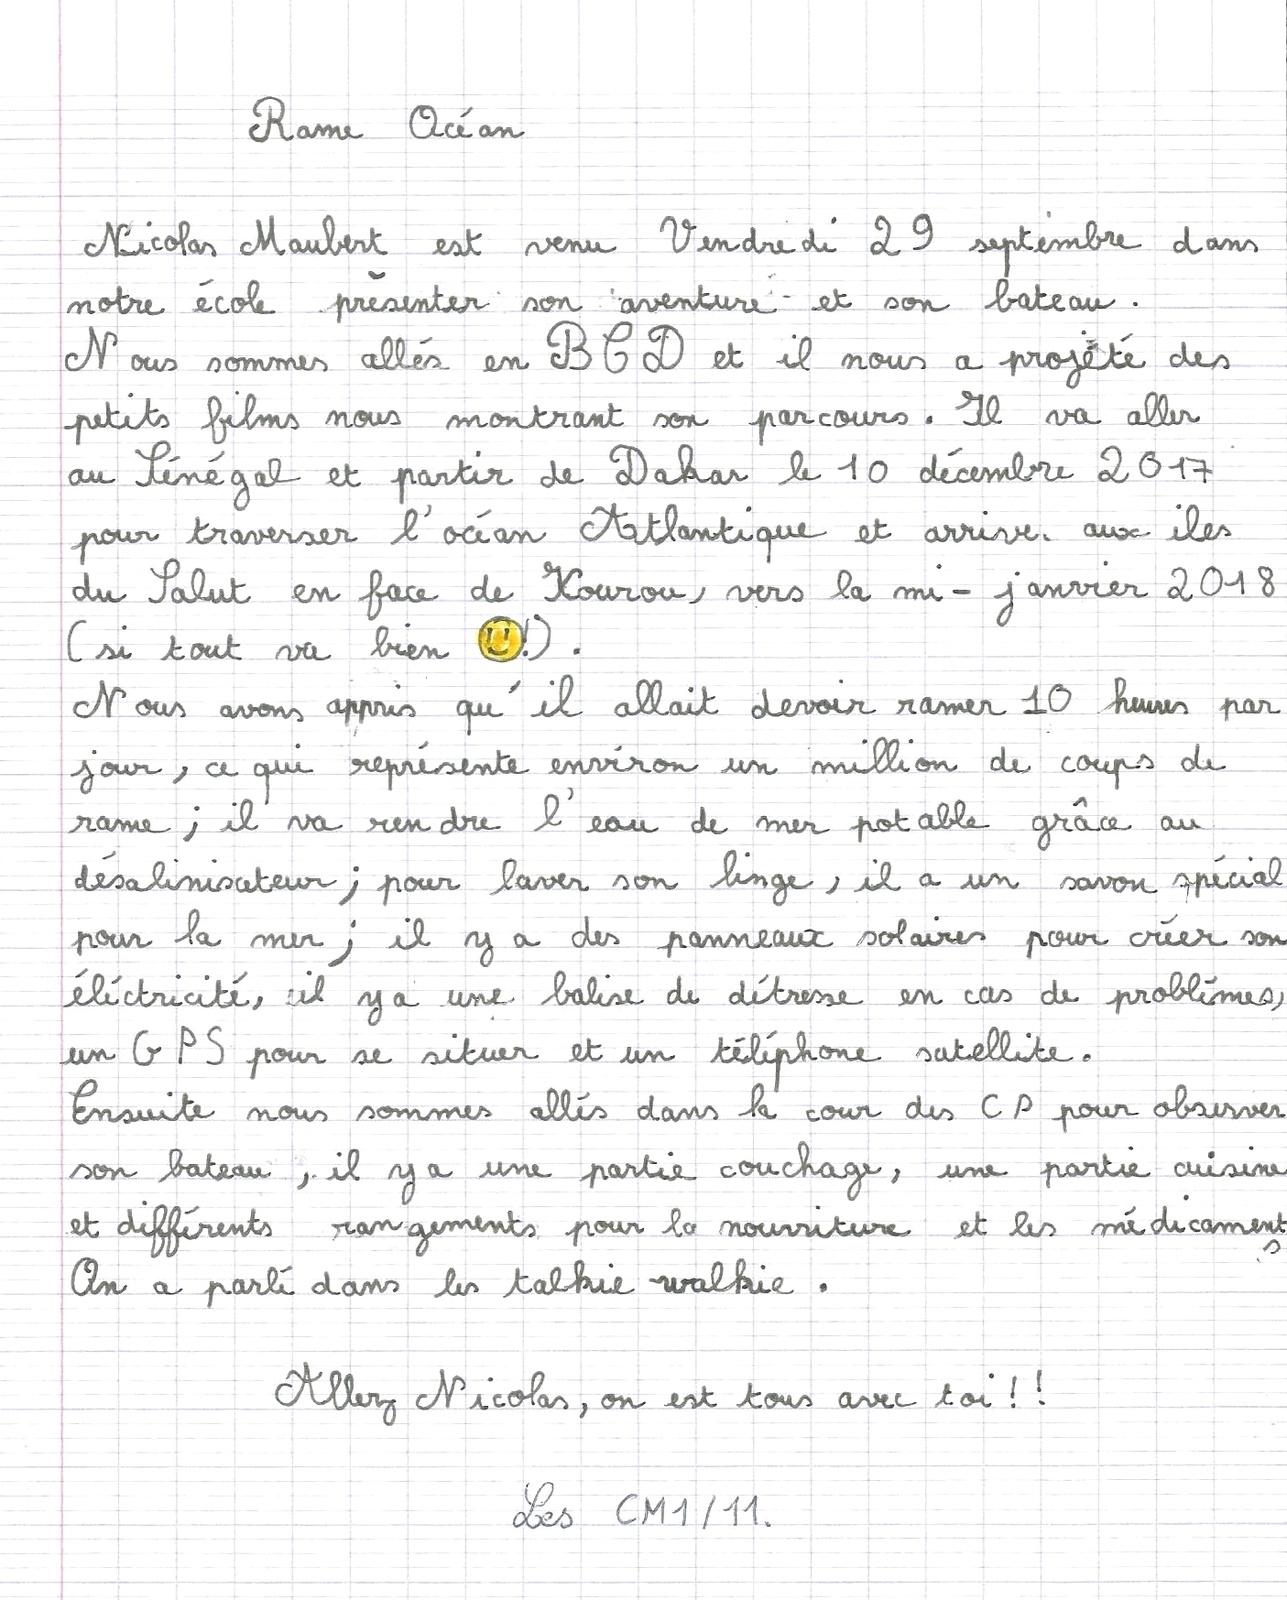 ob_b61506_compte-rendu-visite-nicolas-maubert-00